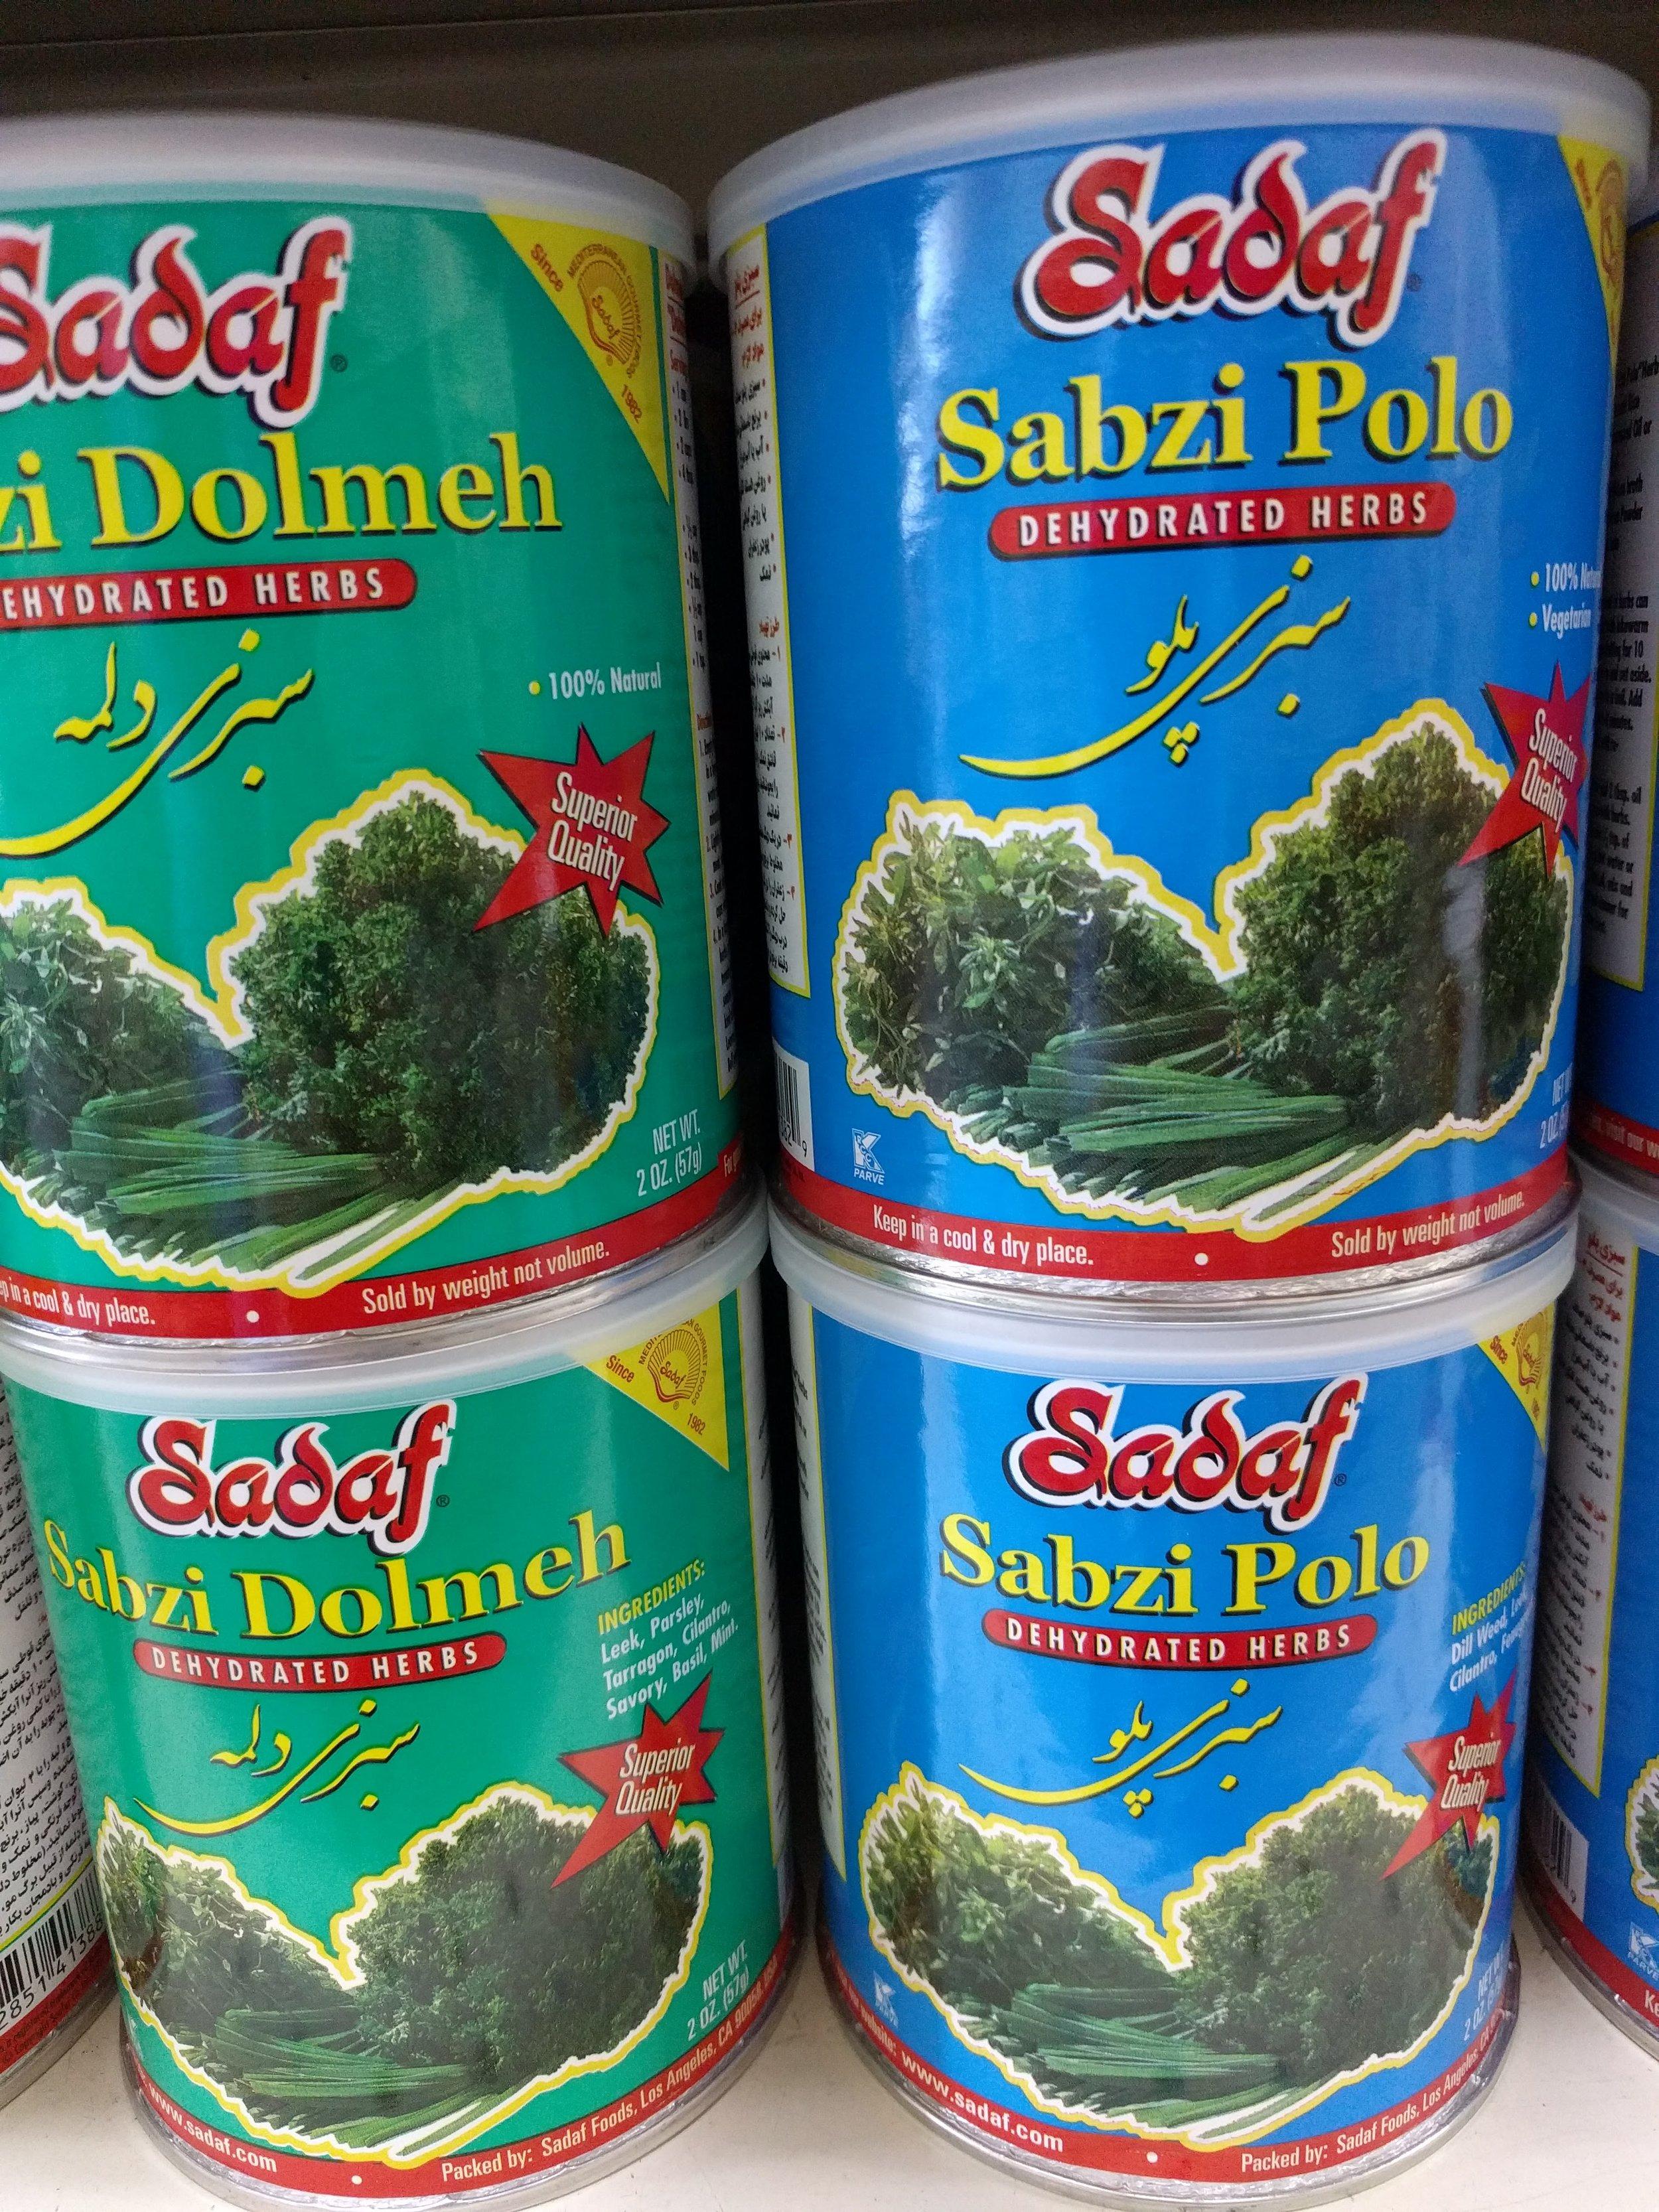 Sadaf-saturated-herbs-Pak-Halal-International-Foods-12259-W-87th-St-Pkwy-Lenexa-KS-66215.jpg